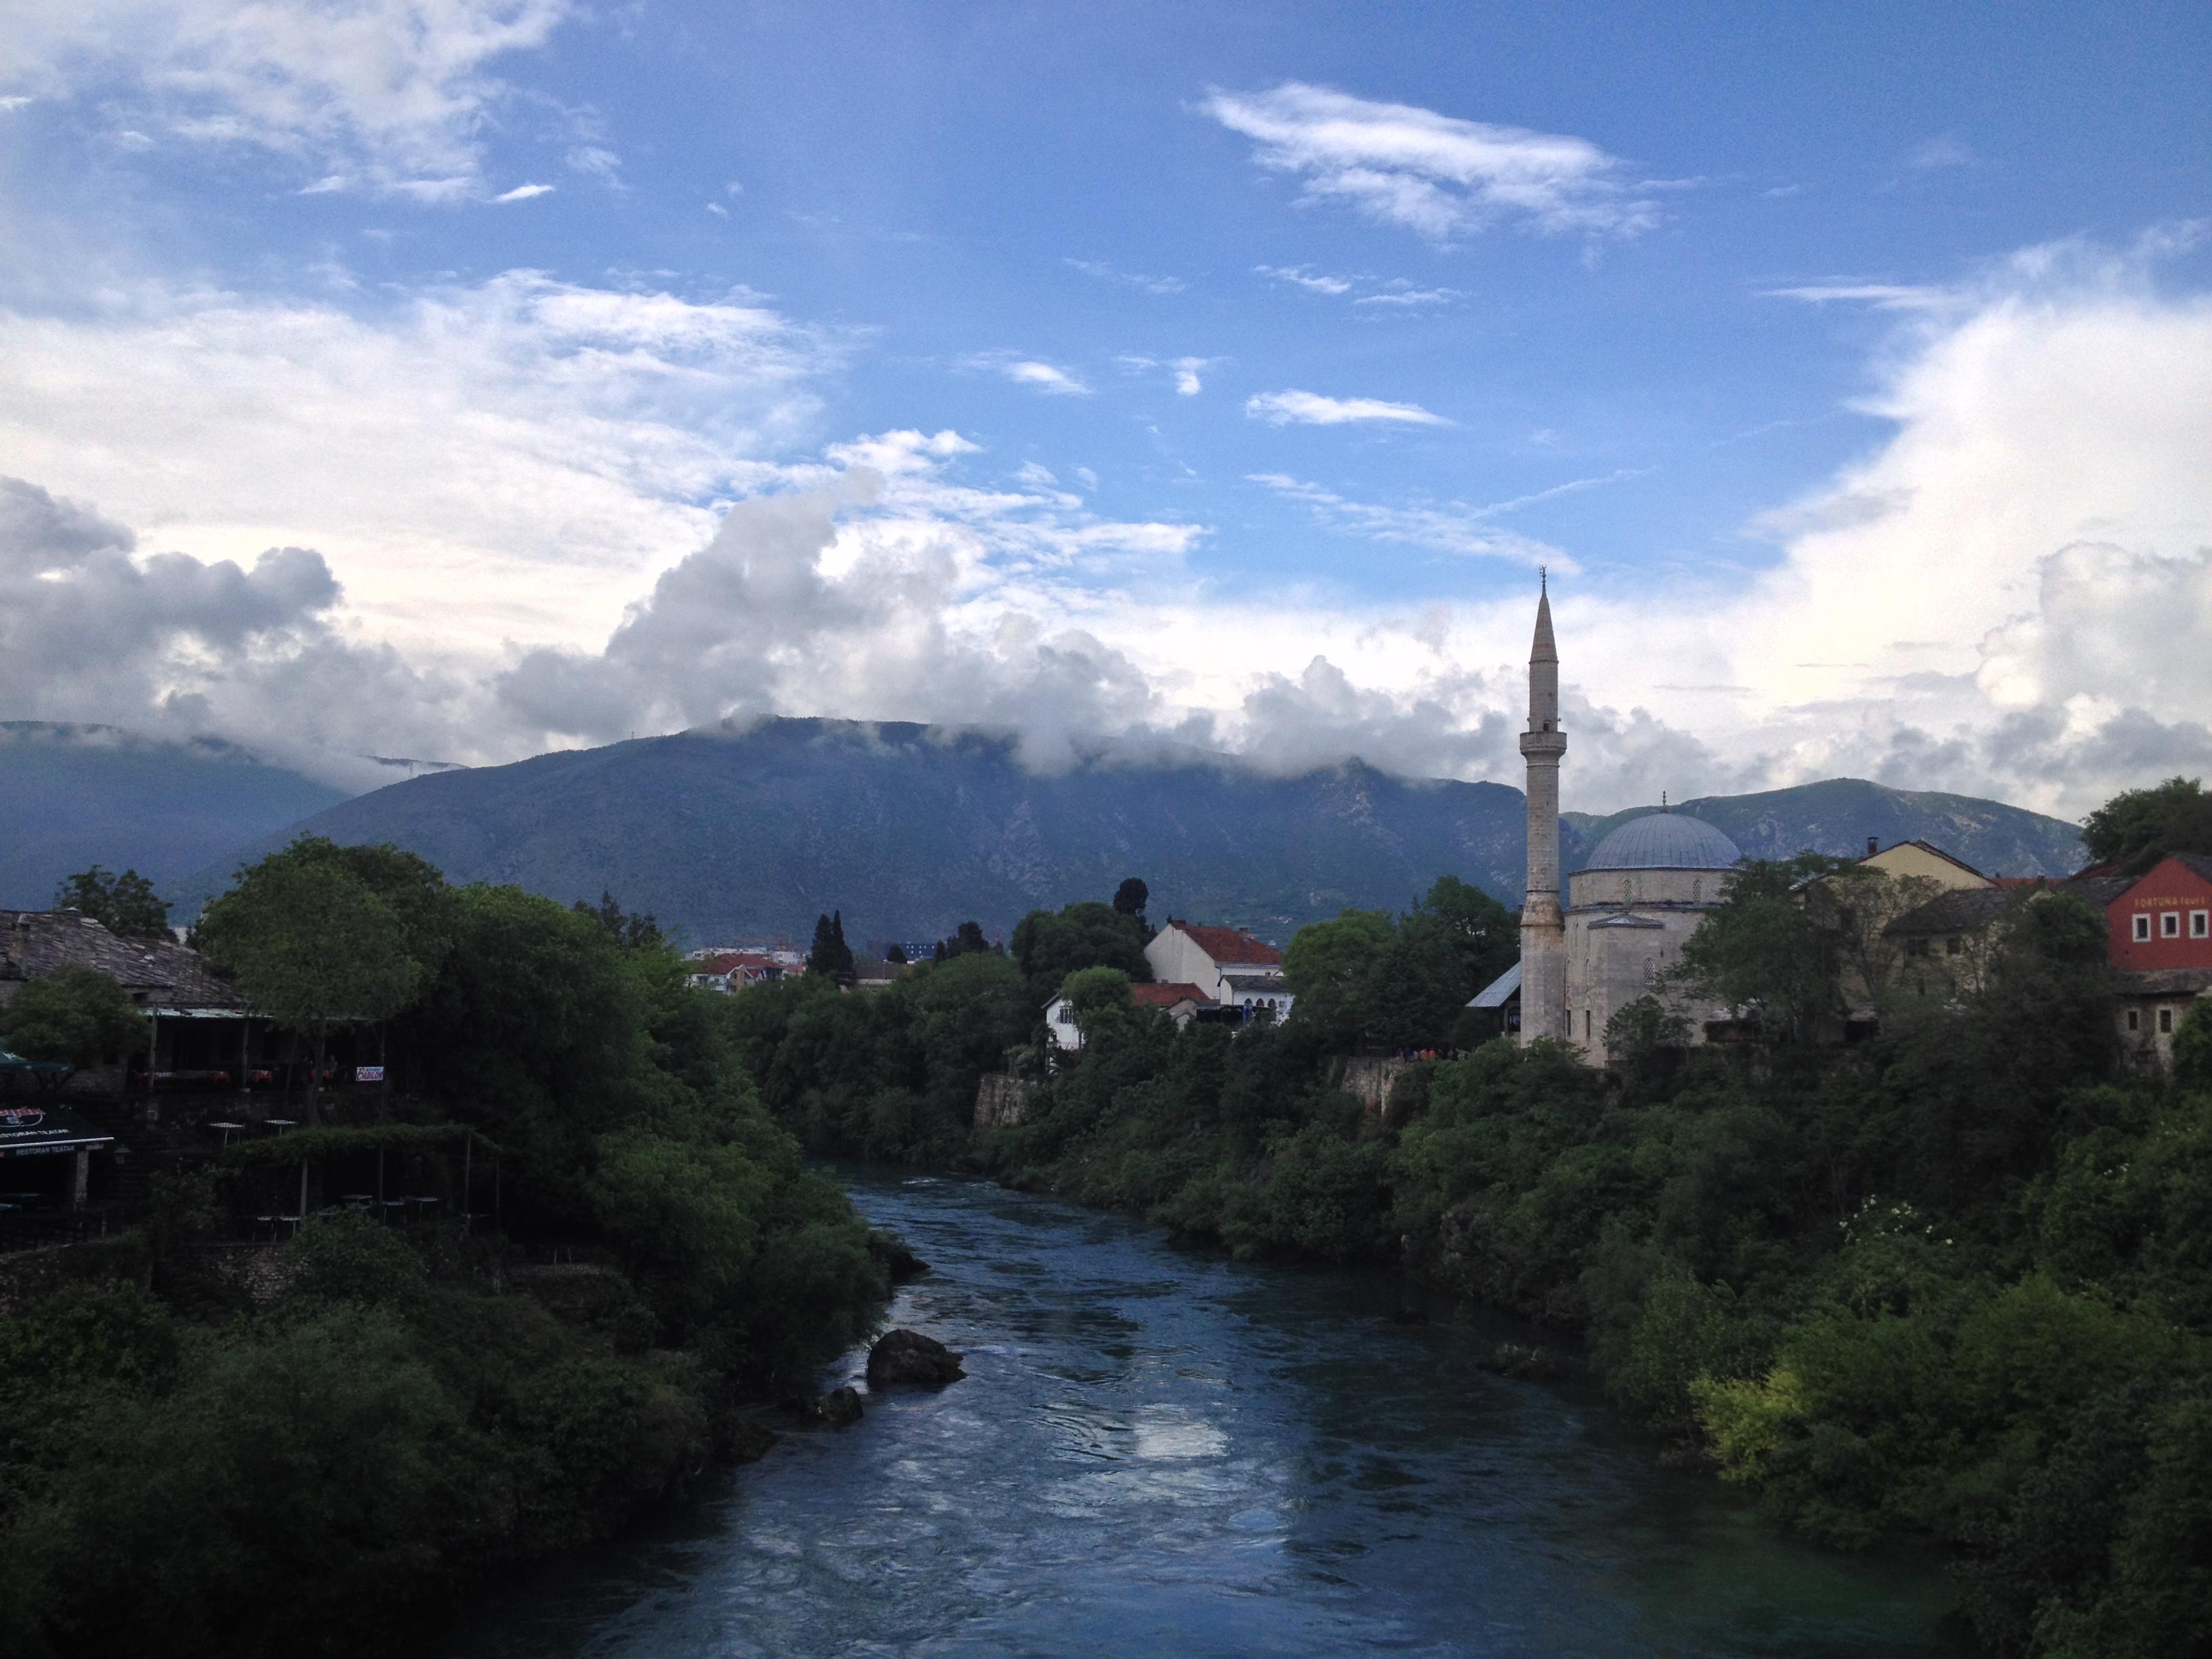 rives de la Neretva à Mostar Bosnie-Herzégovine